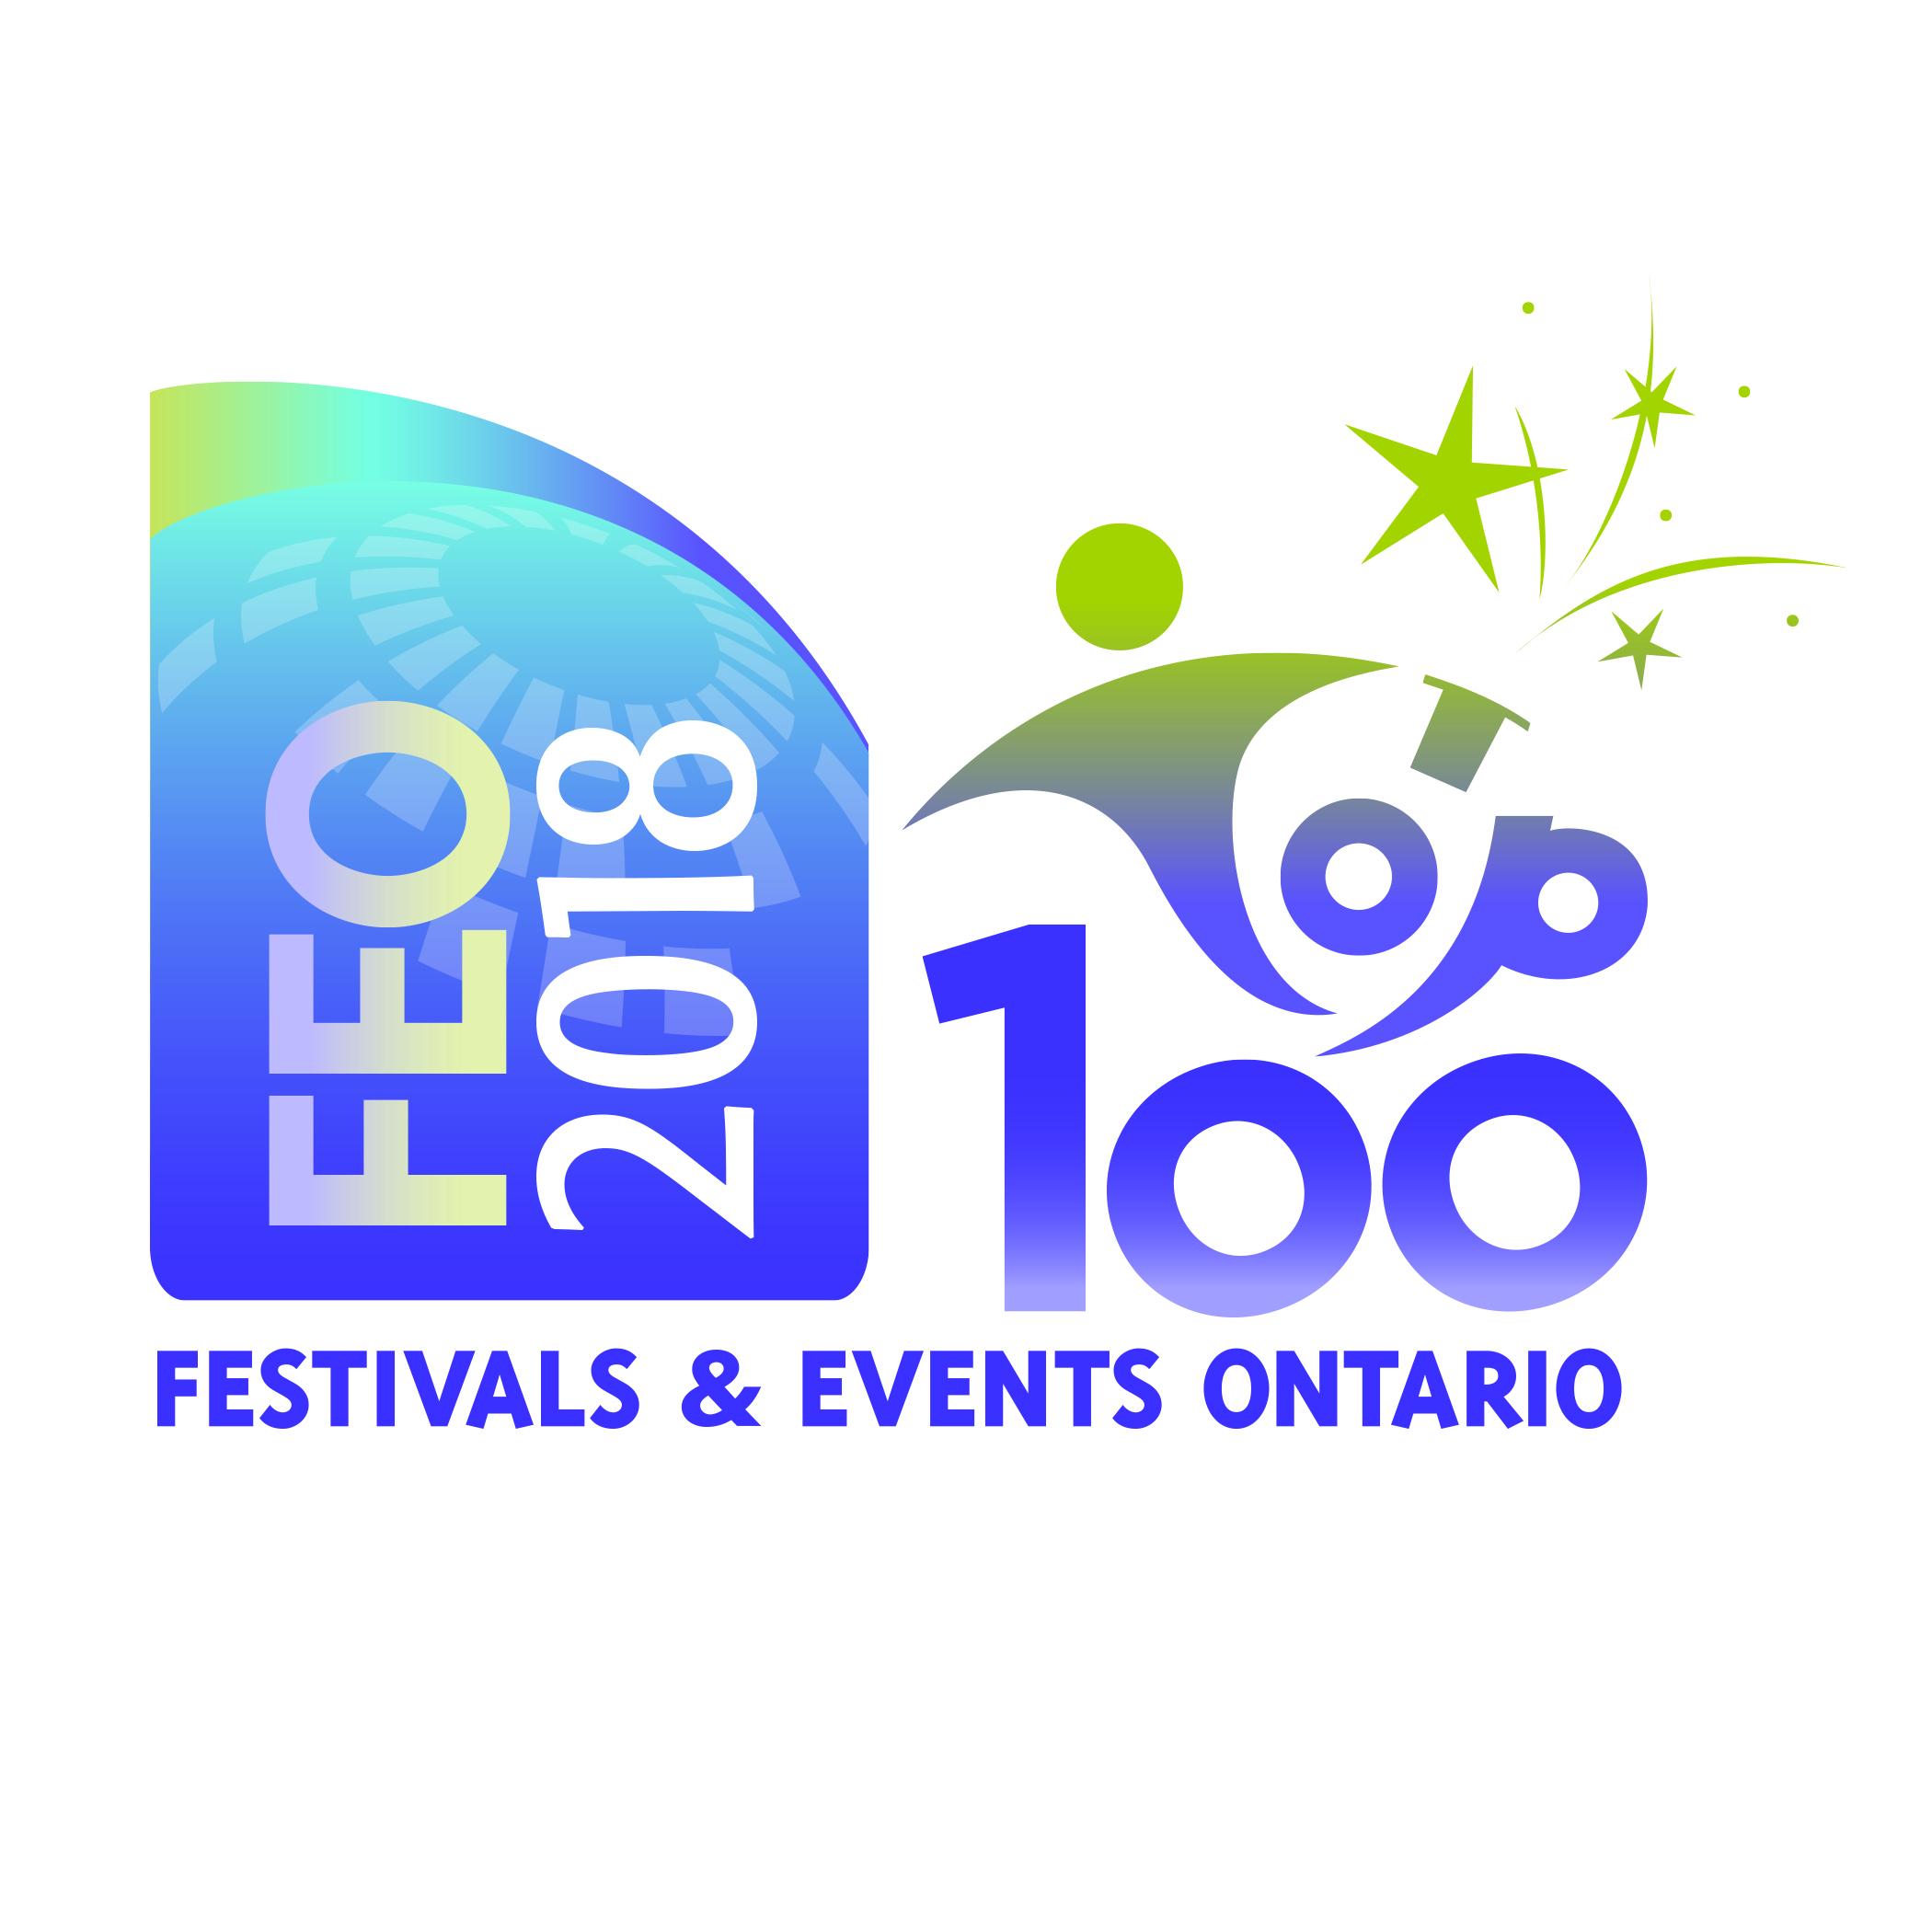 FEO Top 100 2018